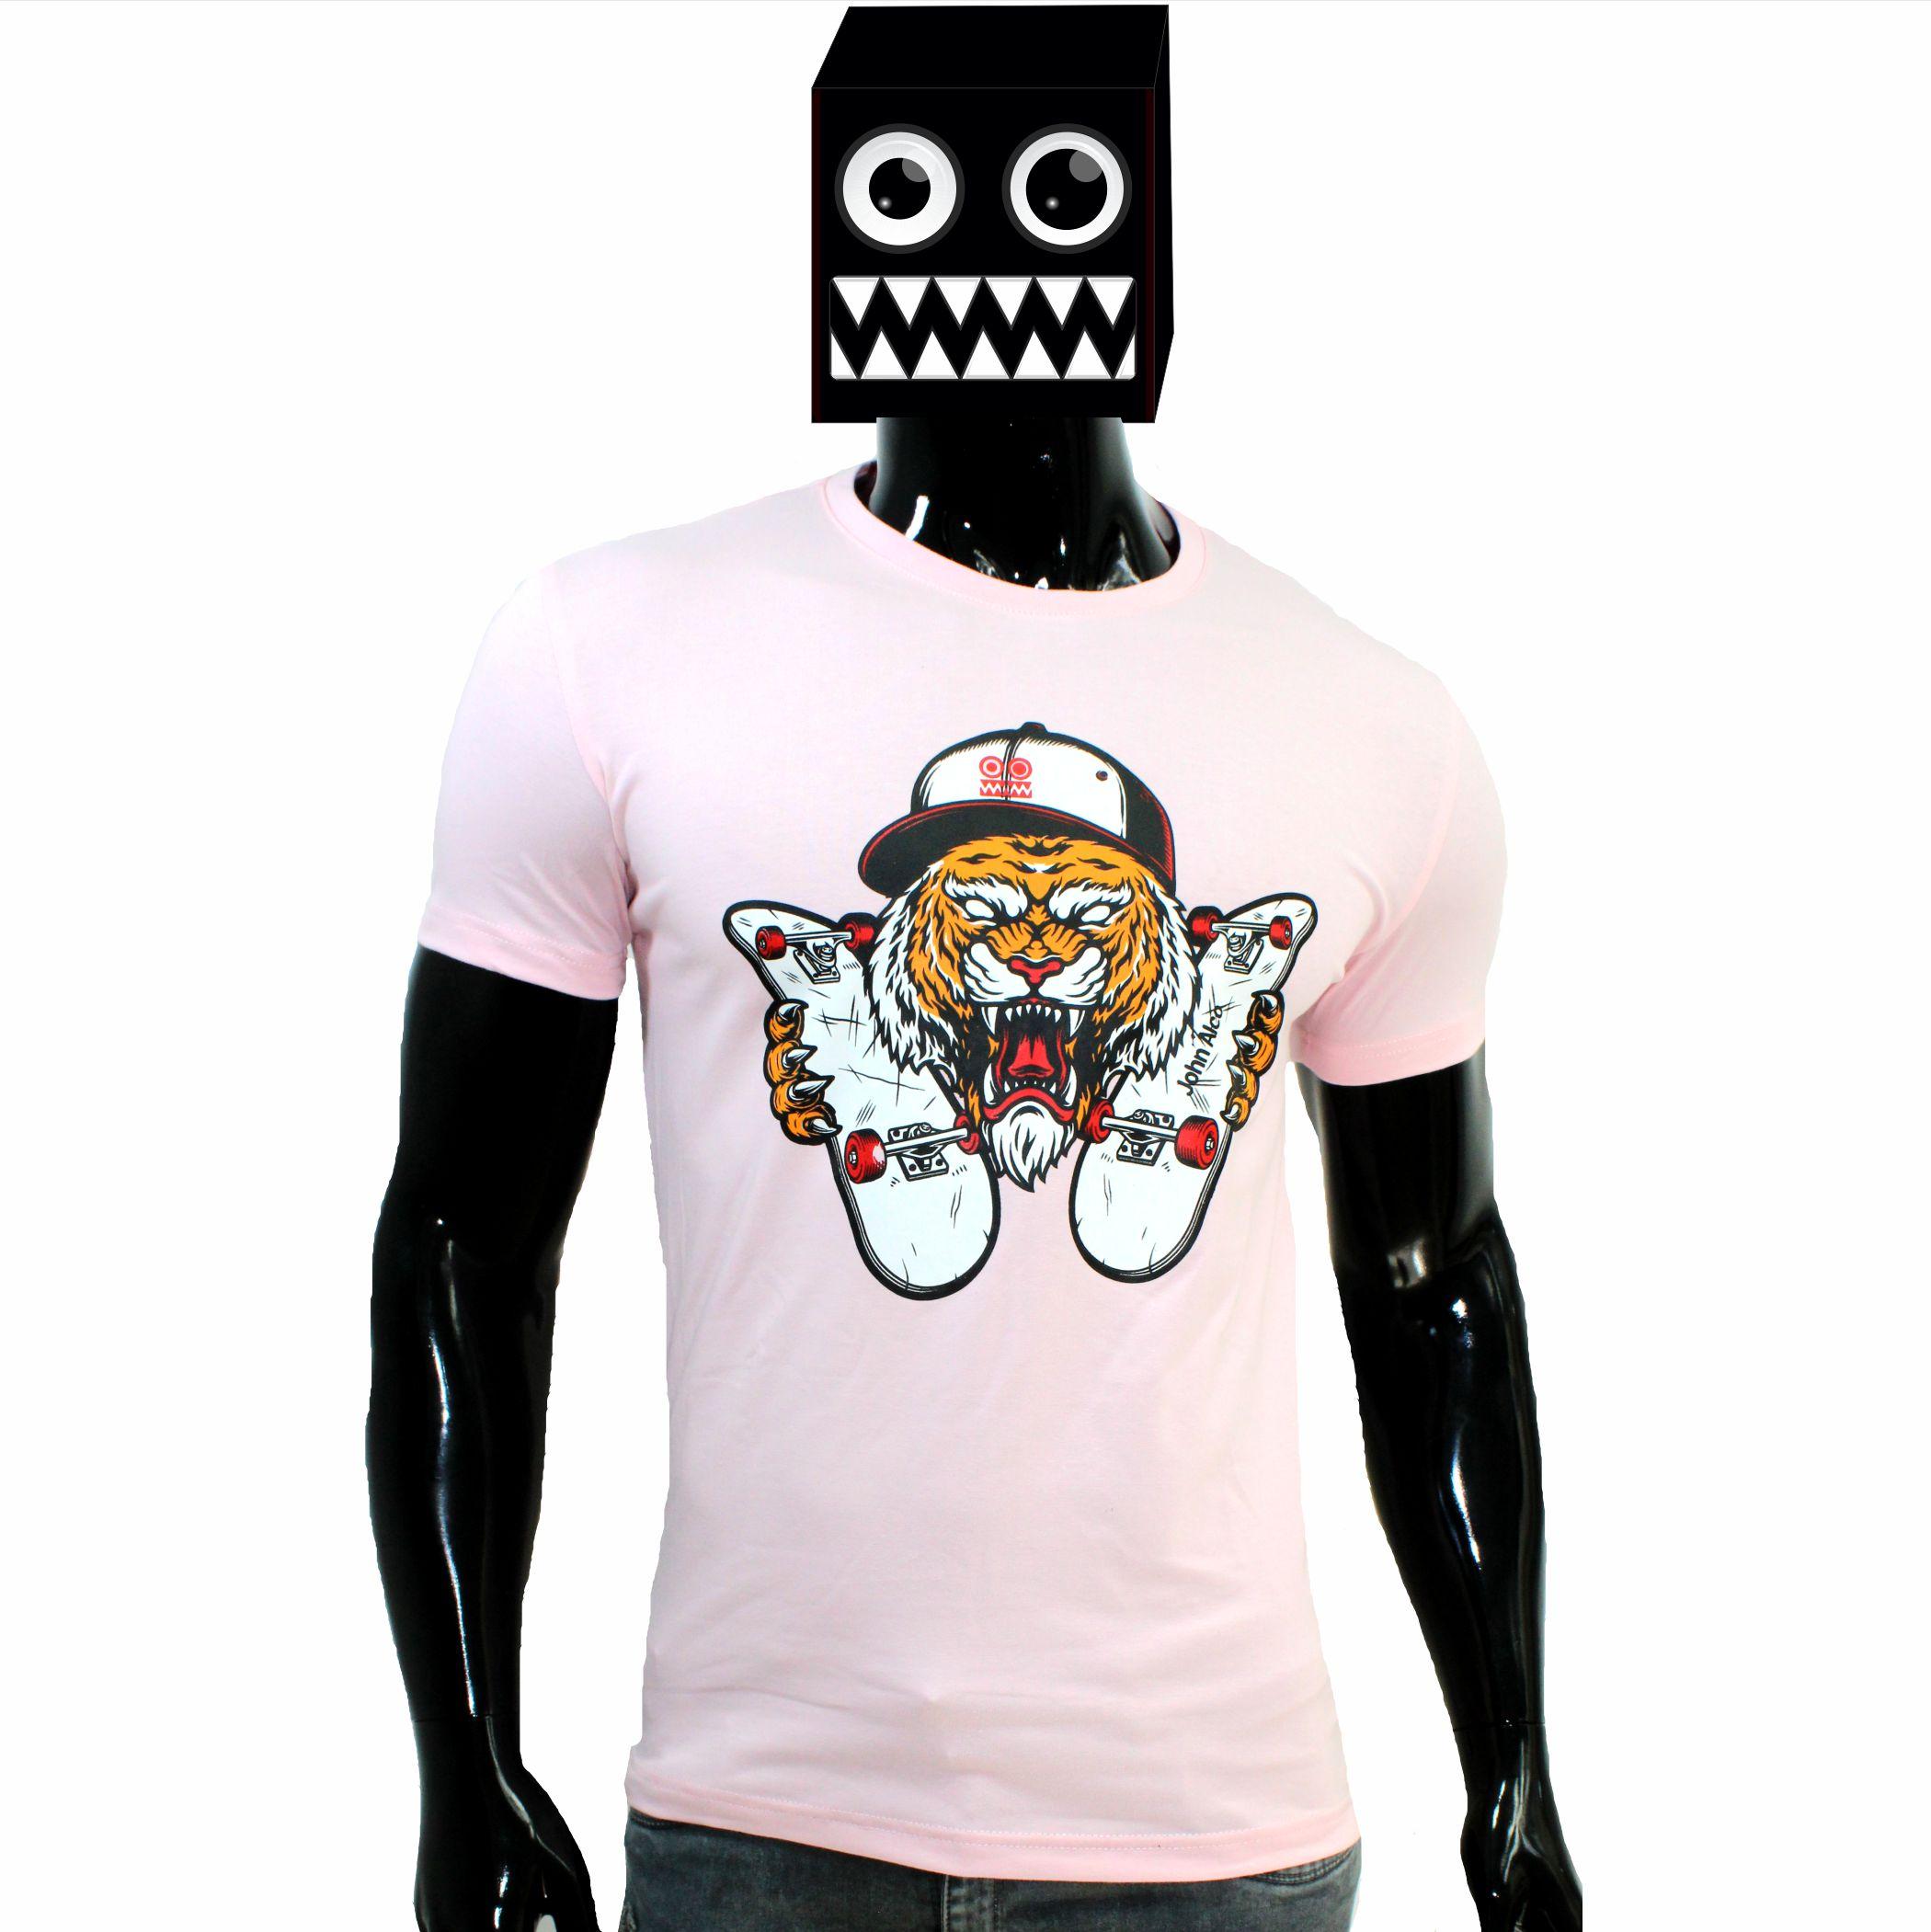 ref 1637  camiseta rosado tigre patineta, tela en algodón expande